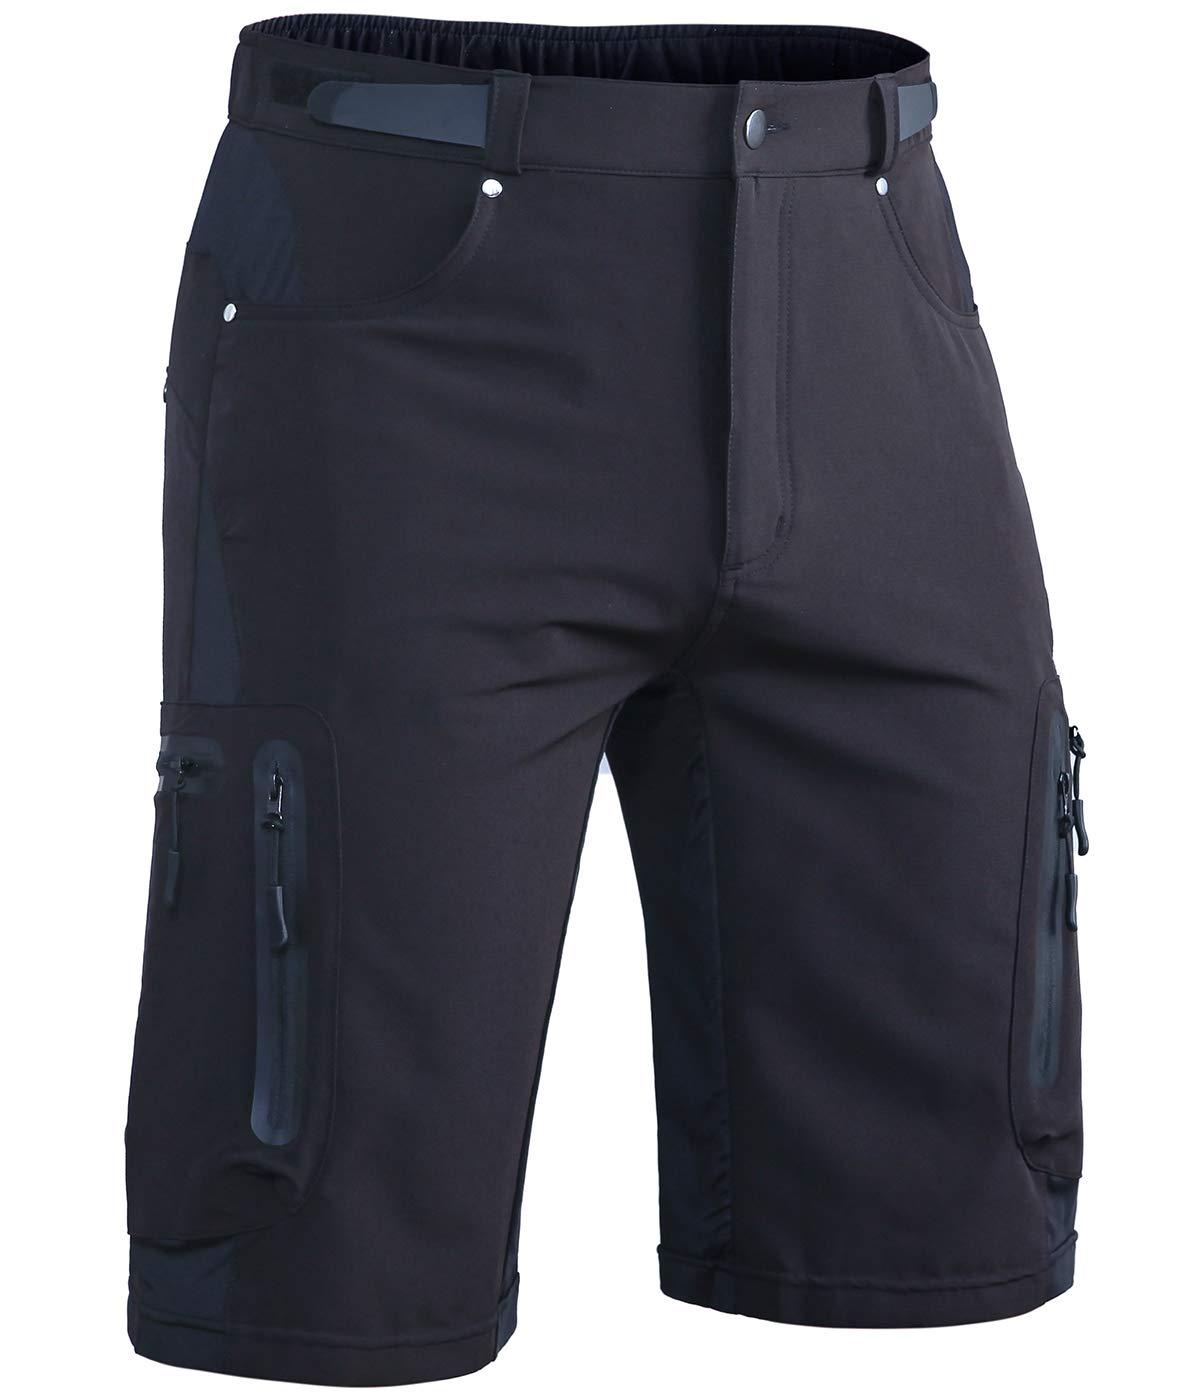 Mountain Bike Shorts Pants Cycorld MTB Mens Cycling shorts Water Repellent Baggy Loose Fit Cycle Shorts with Zip Pockets